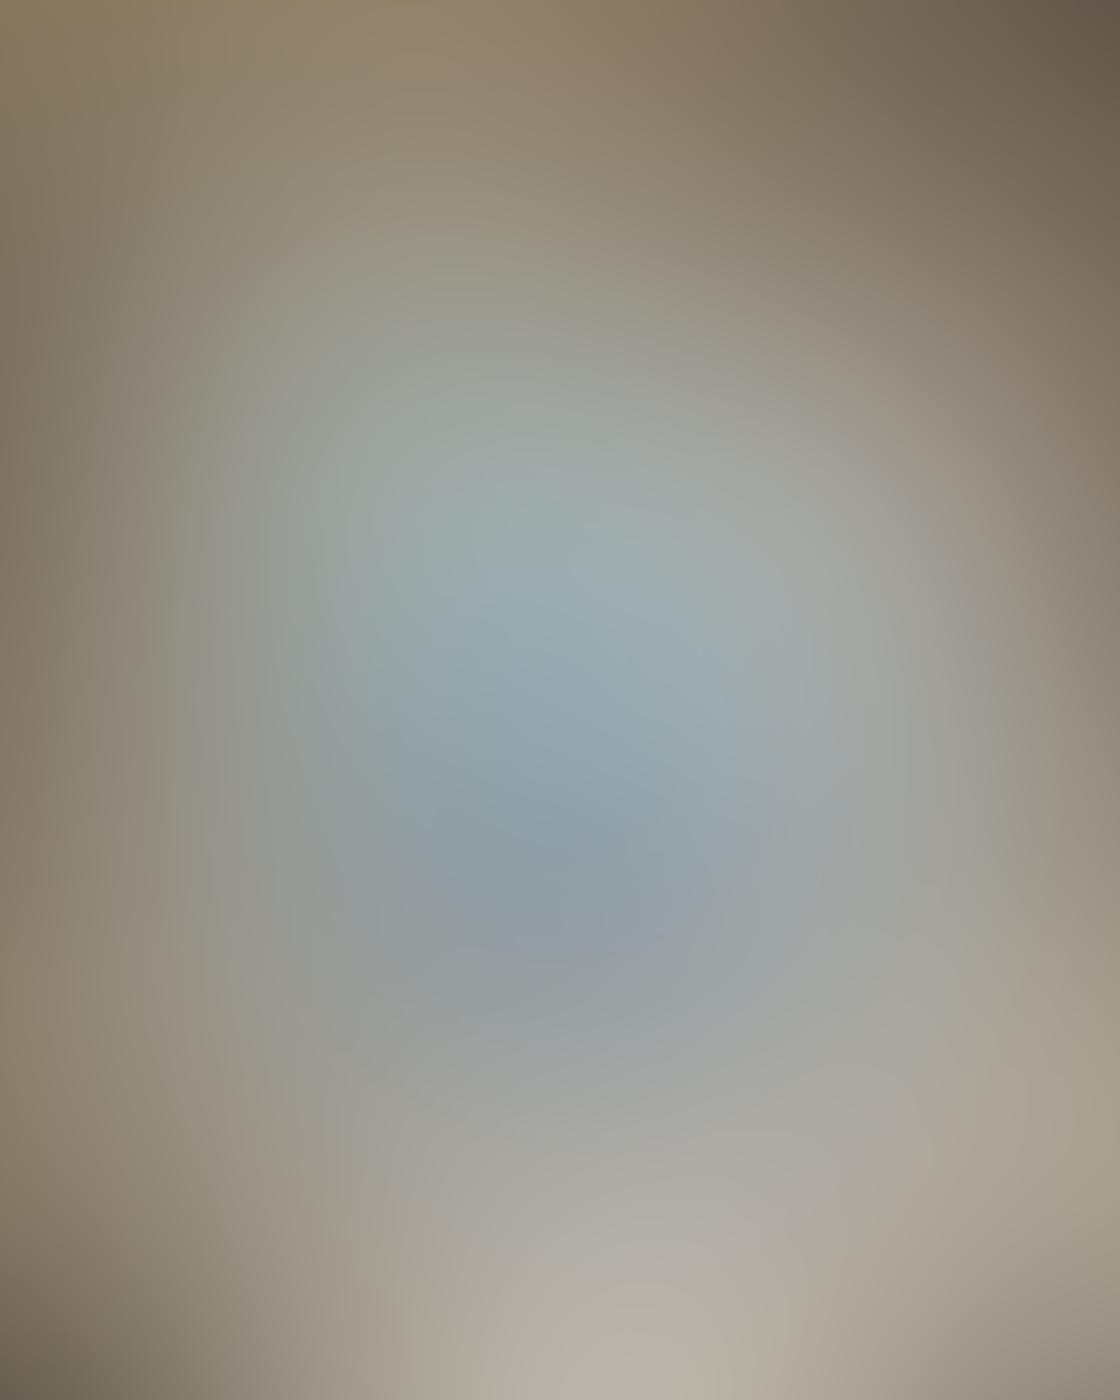 iPhone Photo Perspective 6